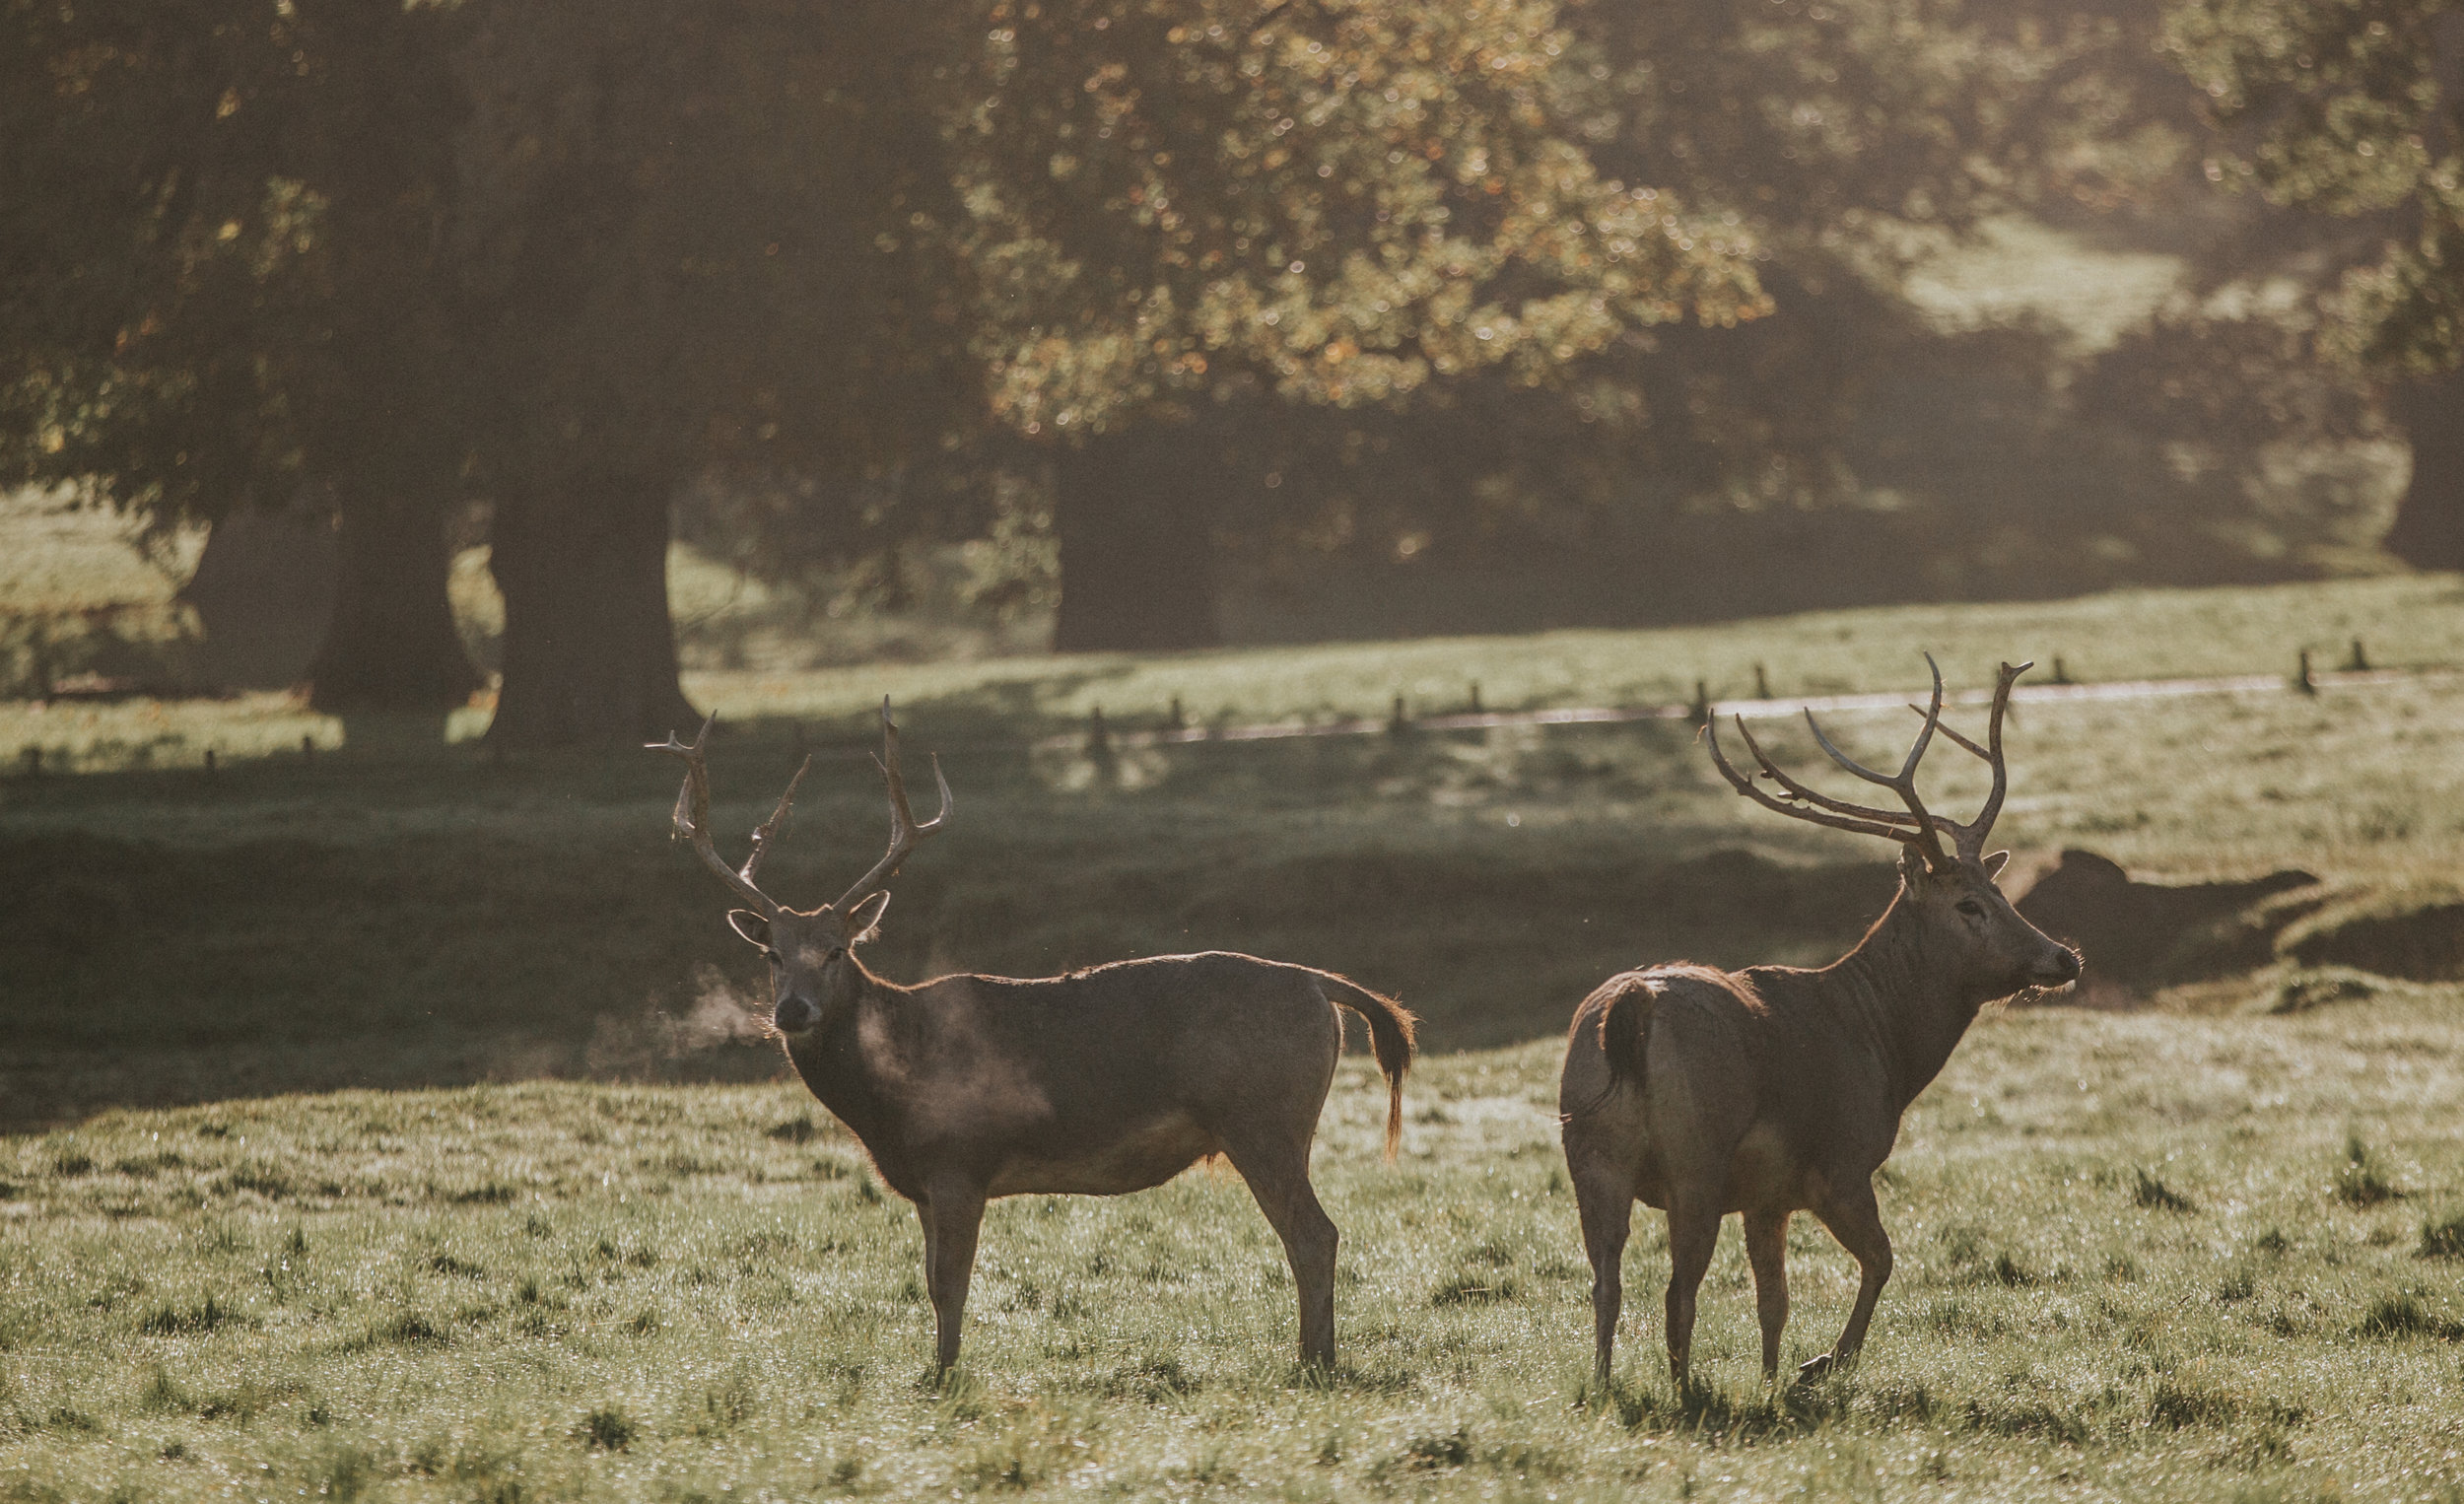 london-bedfordshire-uk-wedding-photography-woburn-sculpture-gallery-deer-101